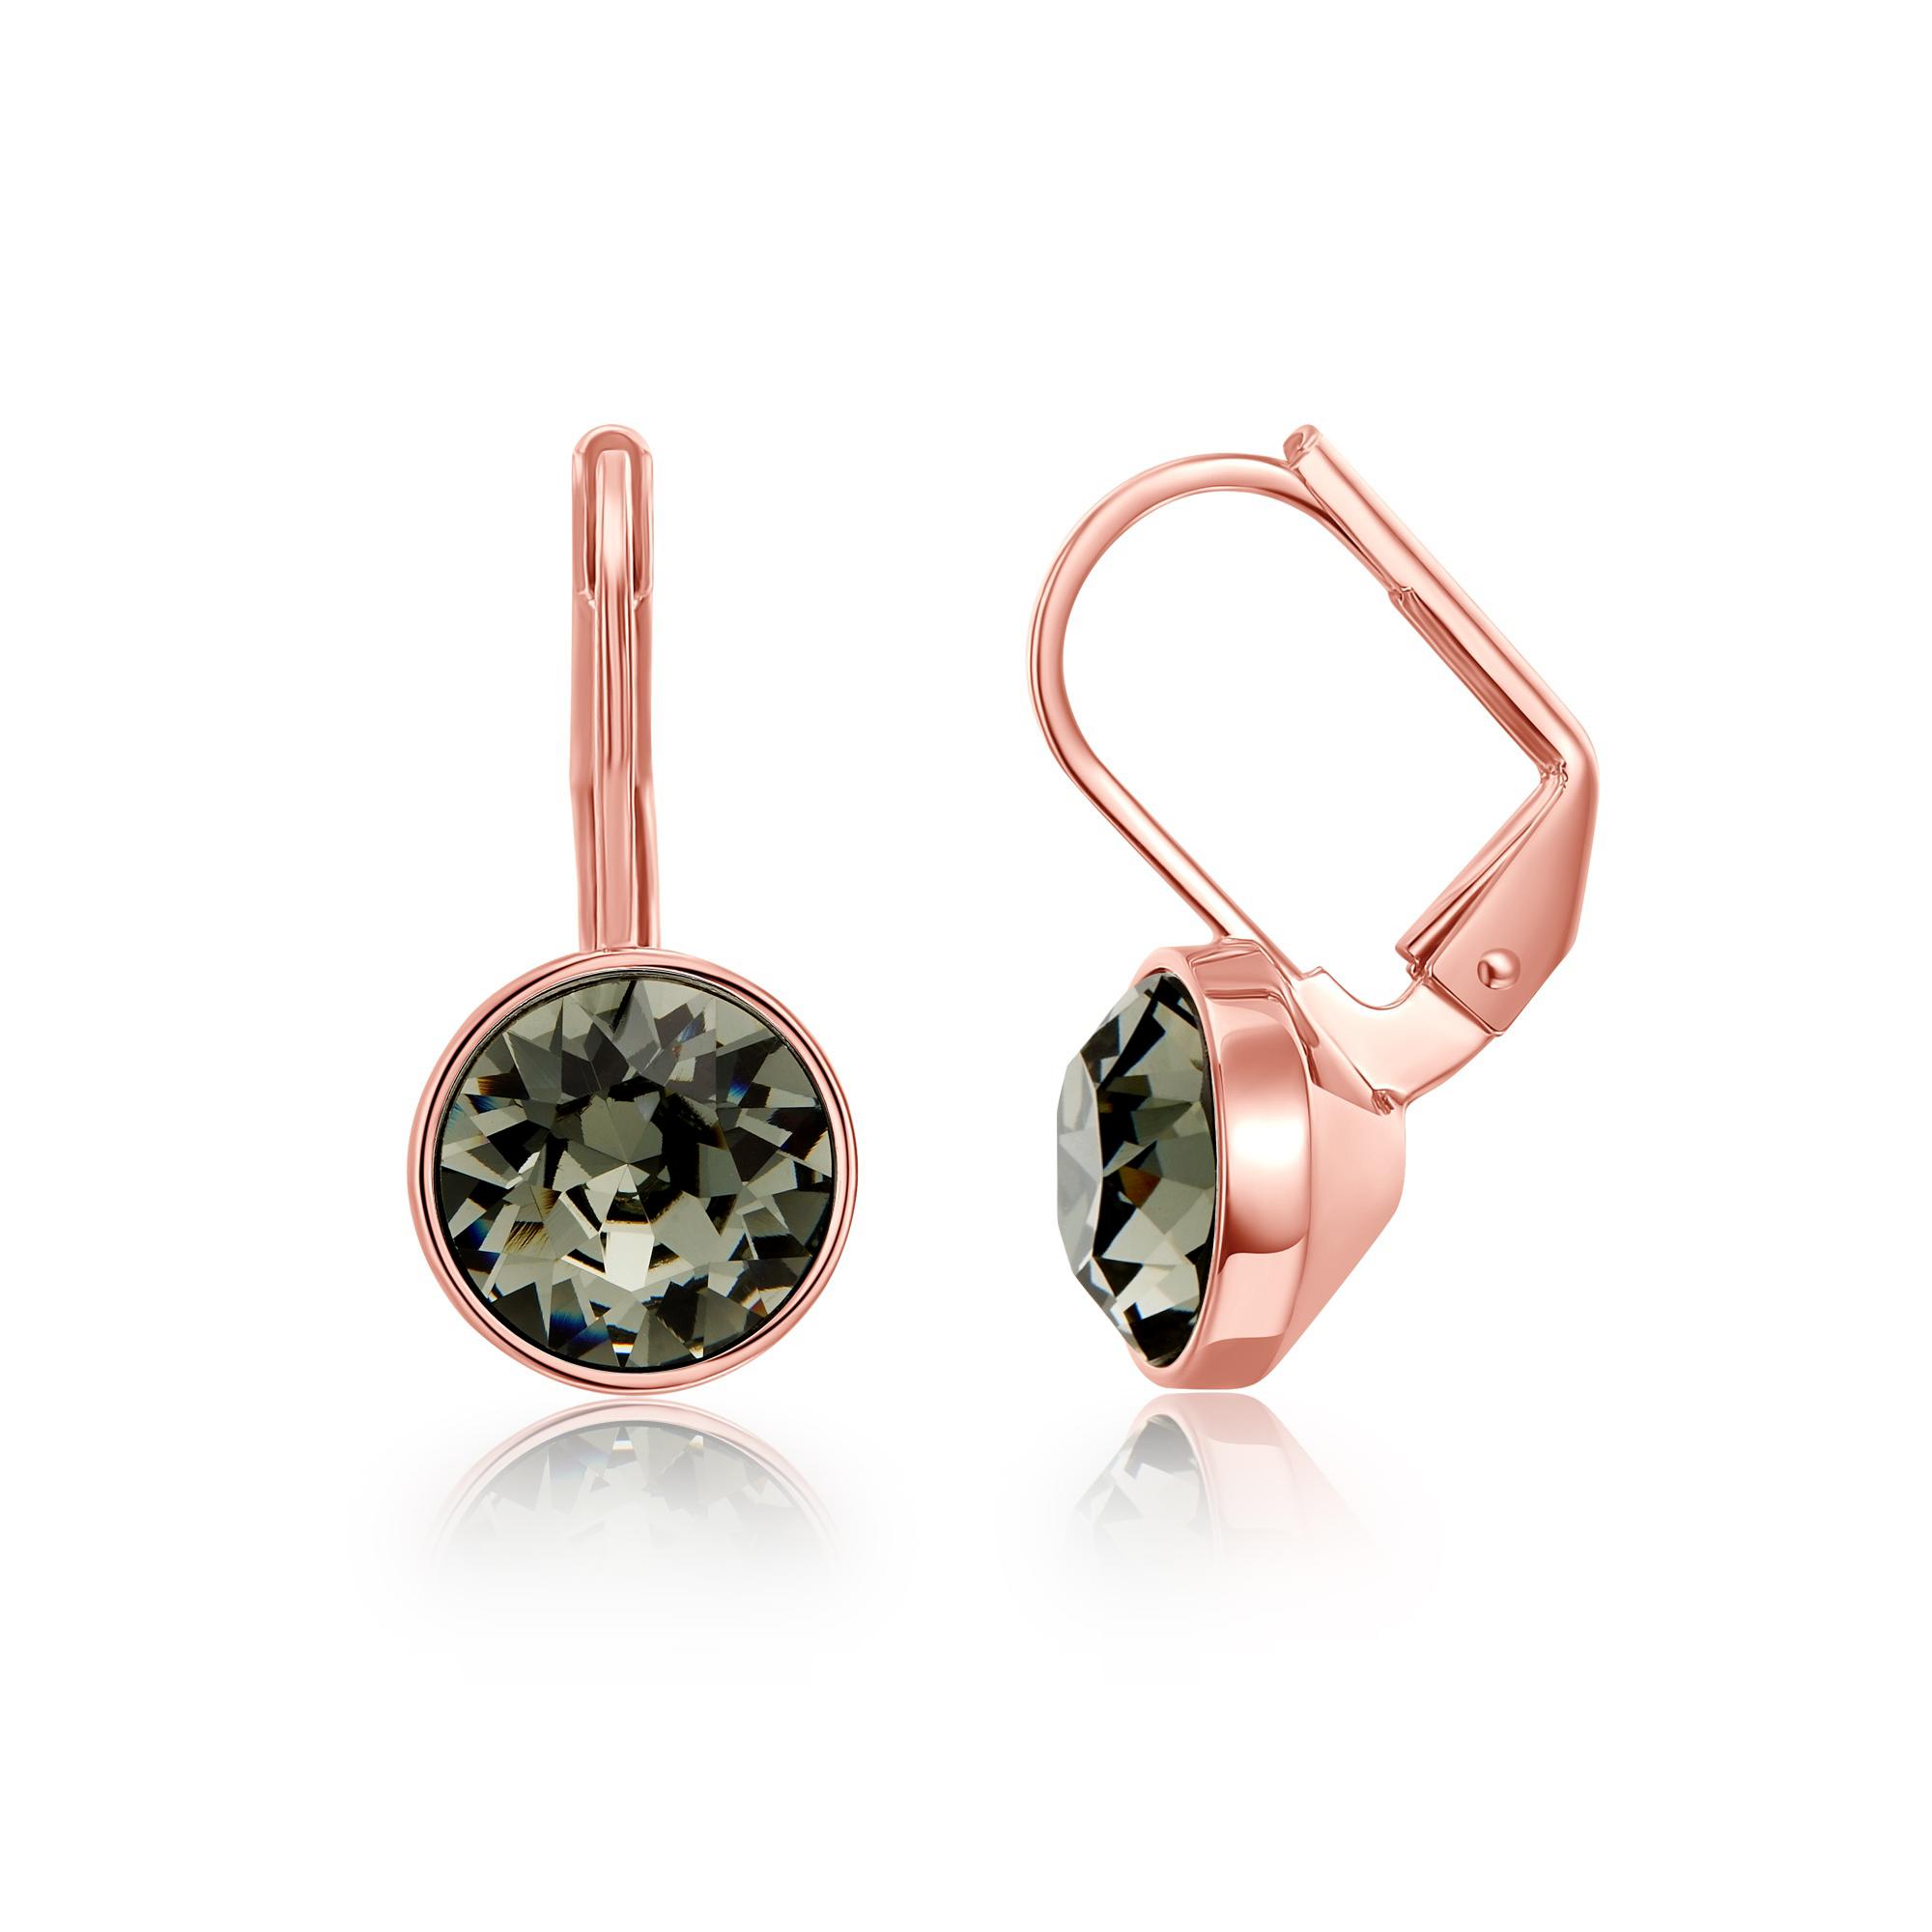 66dda8609 Bella Earrings with 2 Carat Swarovski Black Diamond Crystals Rose Gold  Plated